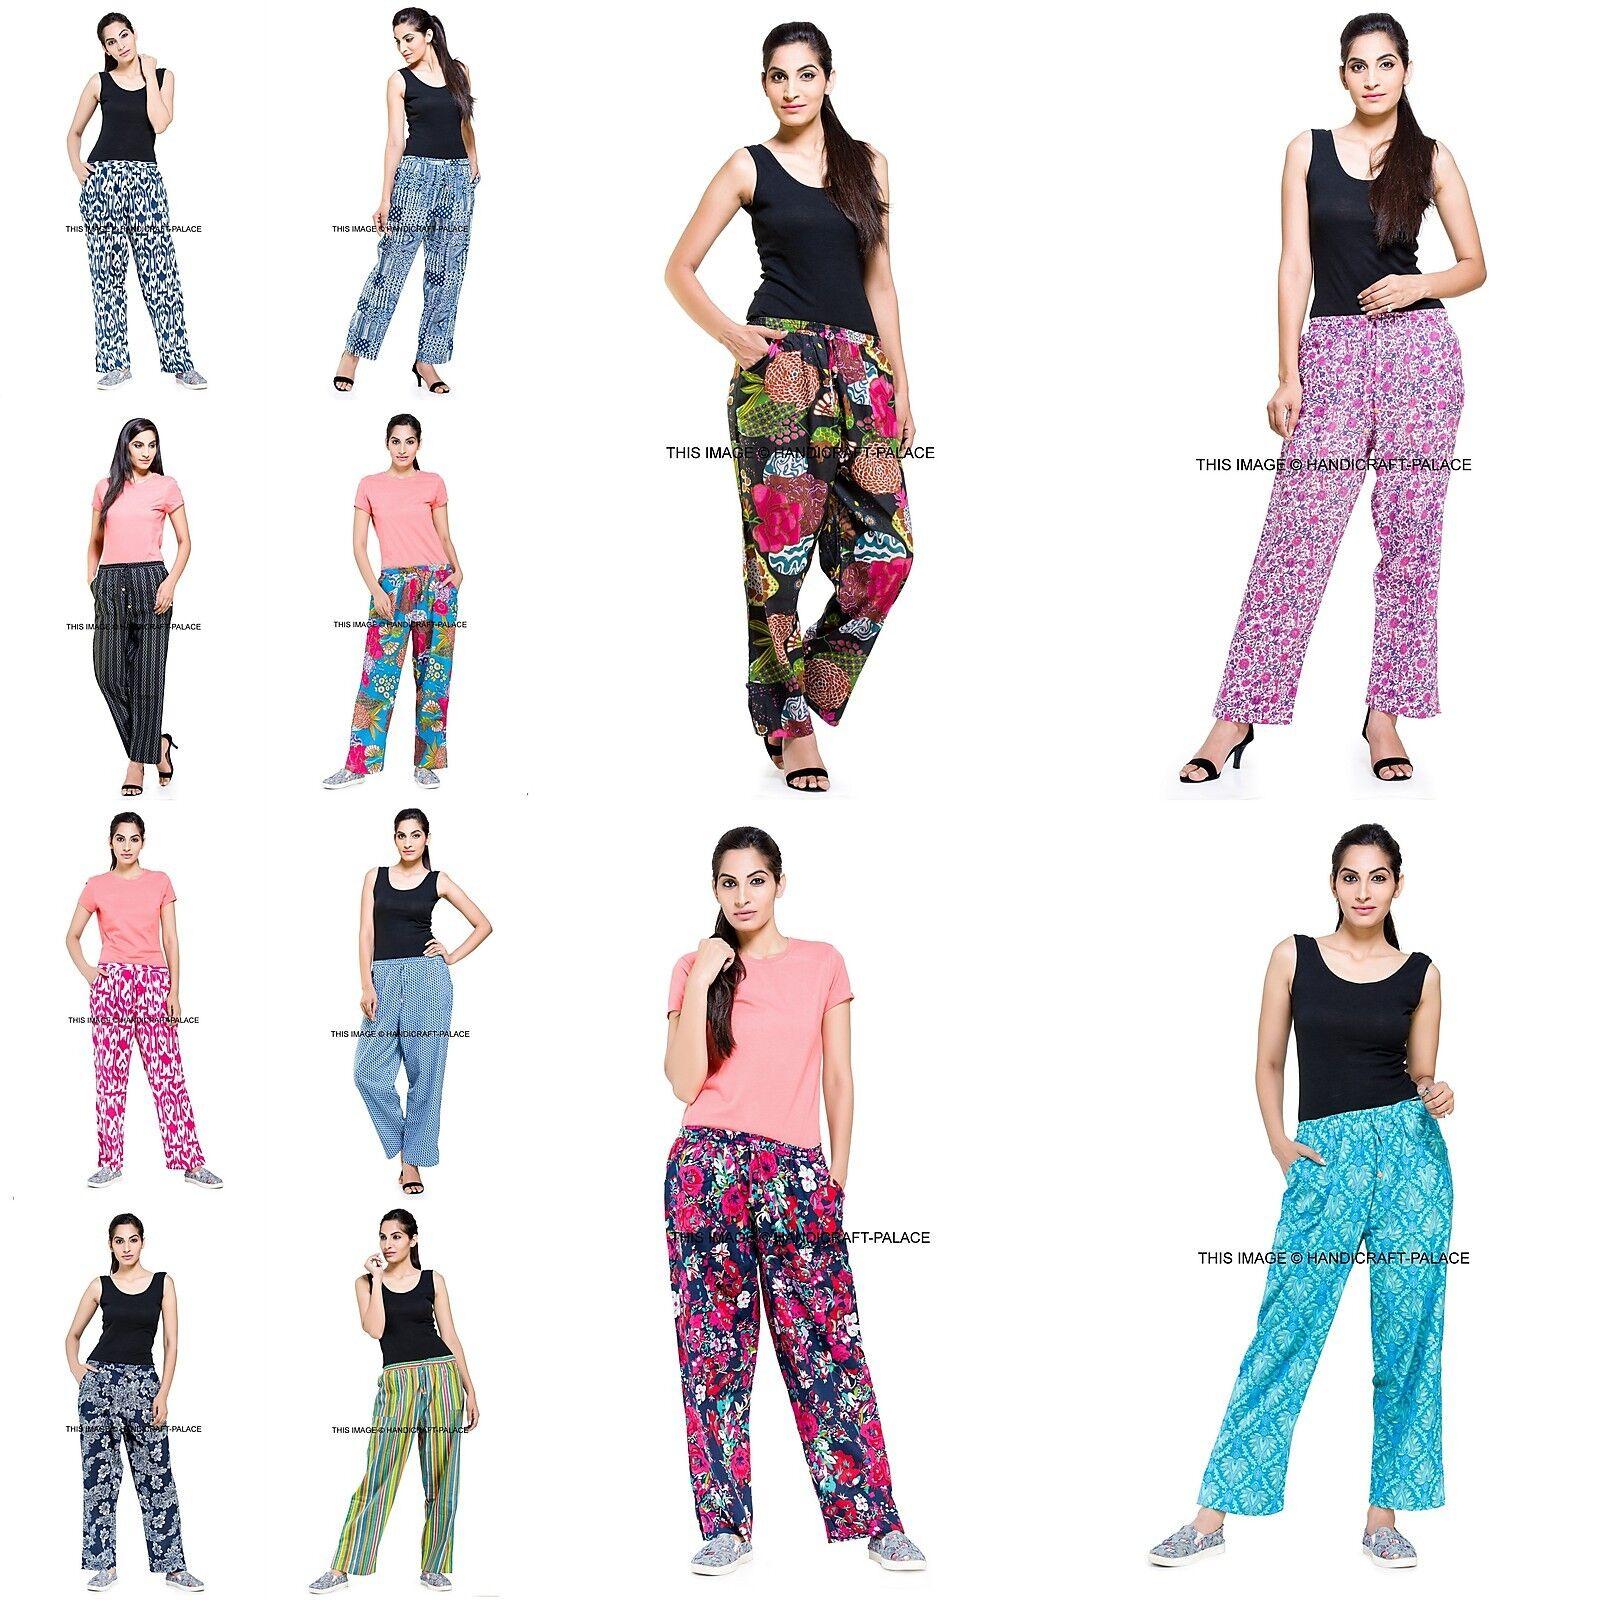 10 PCS Wholesale Lot Harem Beach Pants Indian Trousers Baggy Yoga Women Gypsy